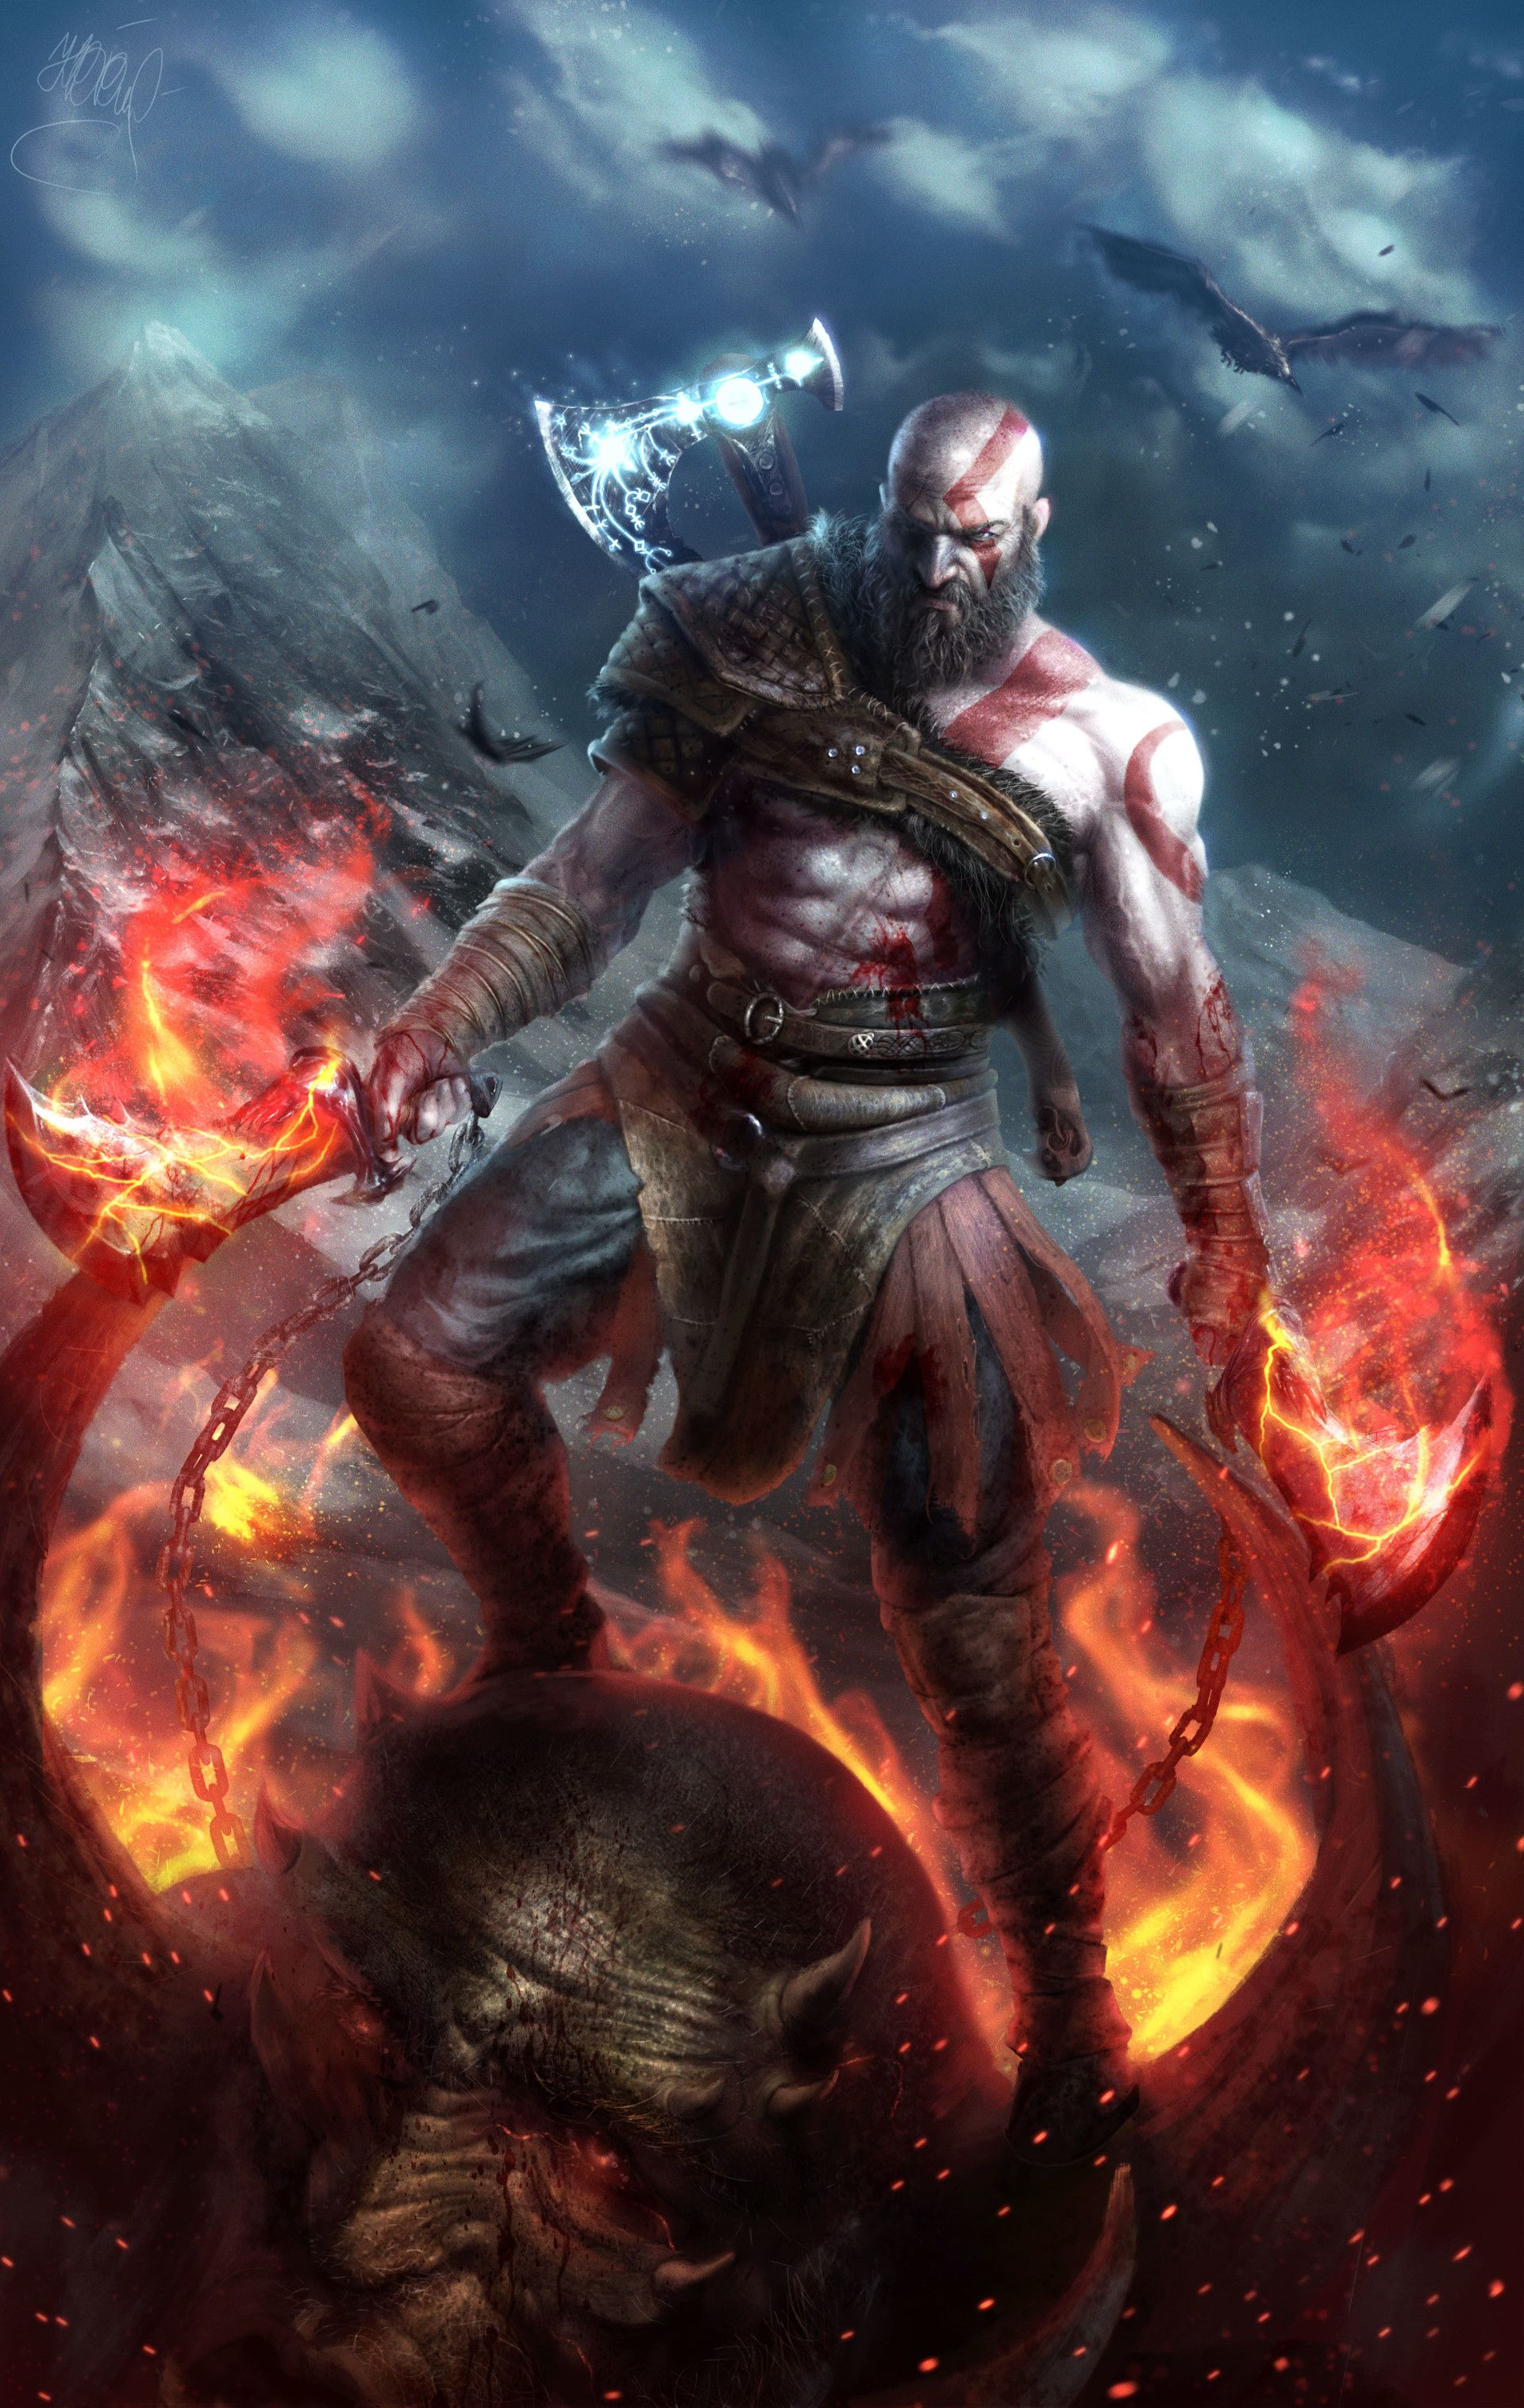 ArtStation - Kratos (God of War 4), Vladyslav Kutuzov | Kratos god of war, God  of war, War art